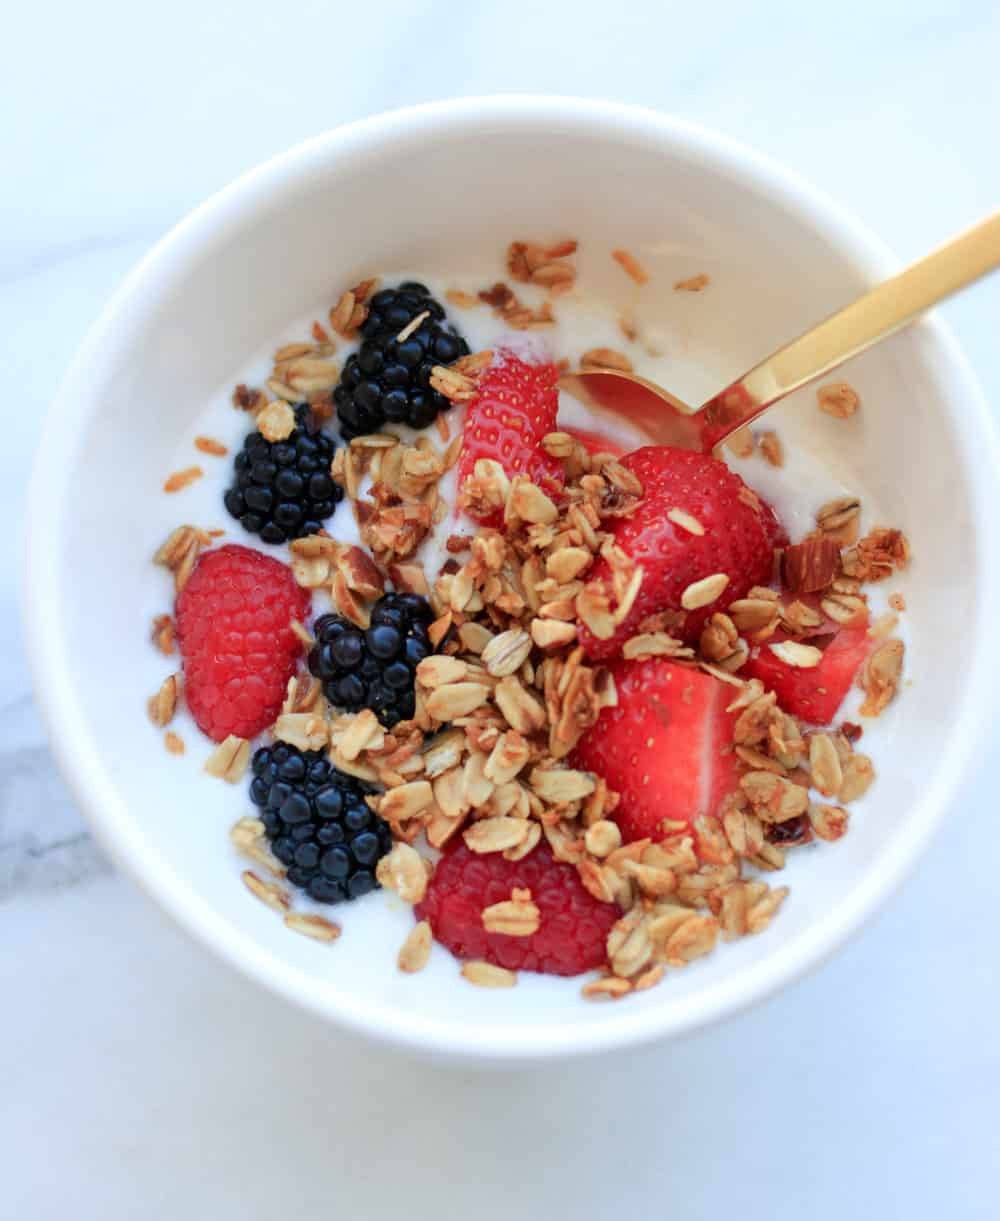 homemade french style yogurt recipe from everyday parisian